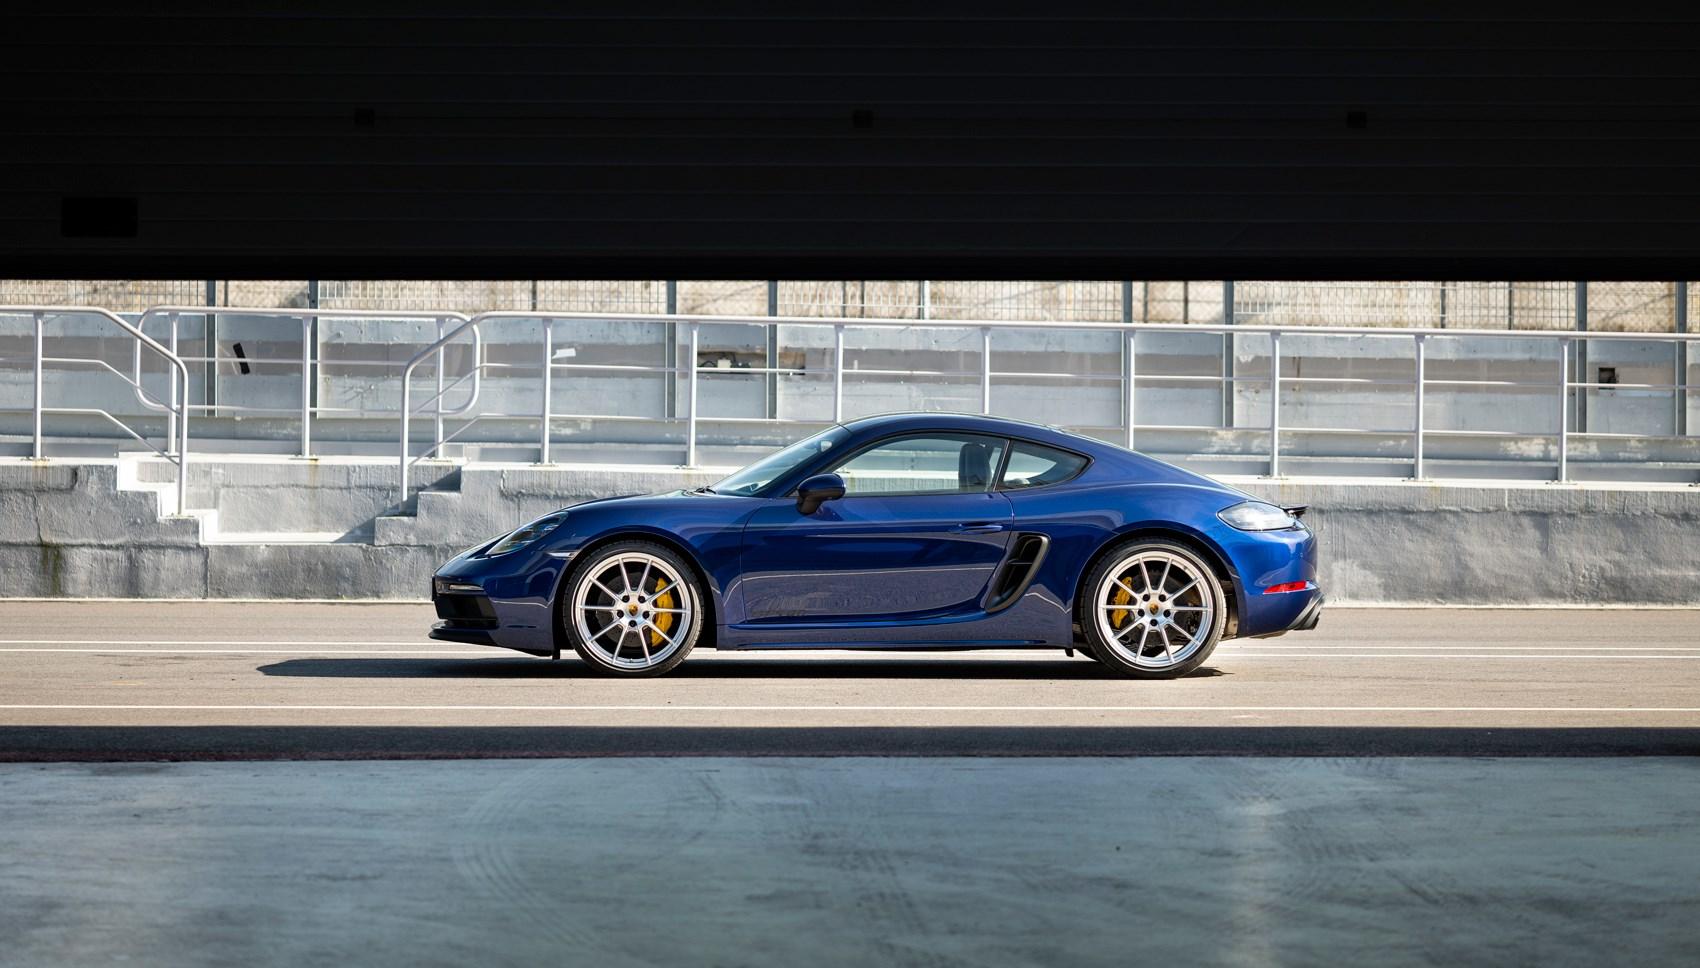 718 GTS 4.0 side